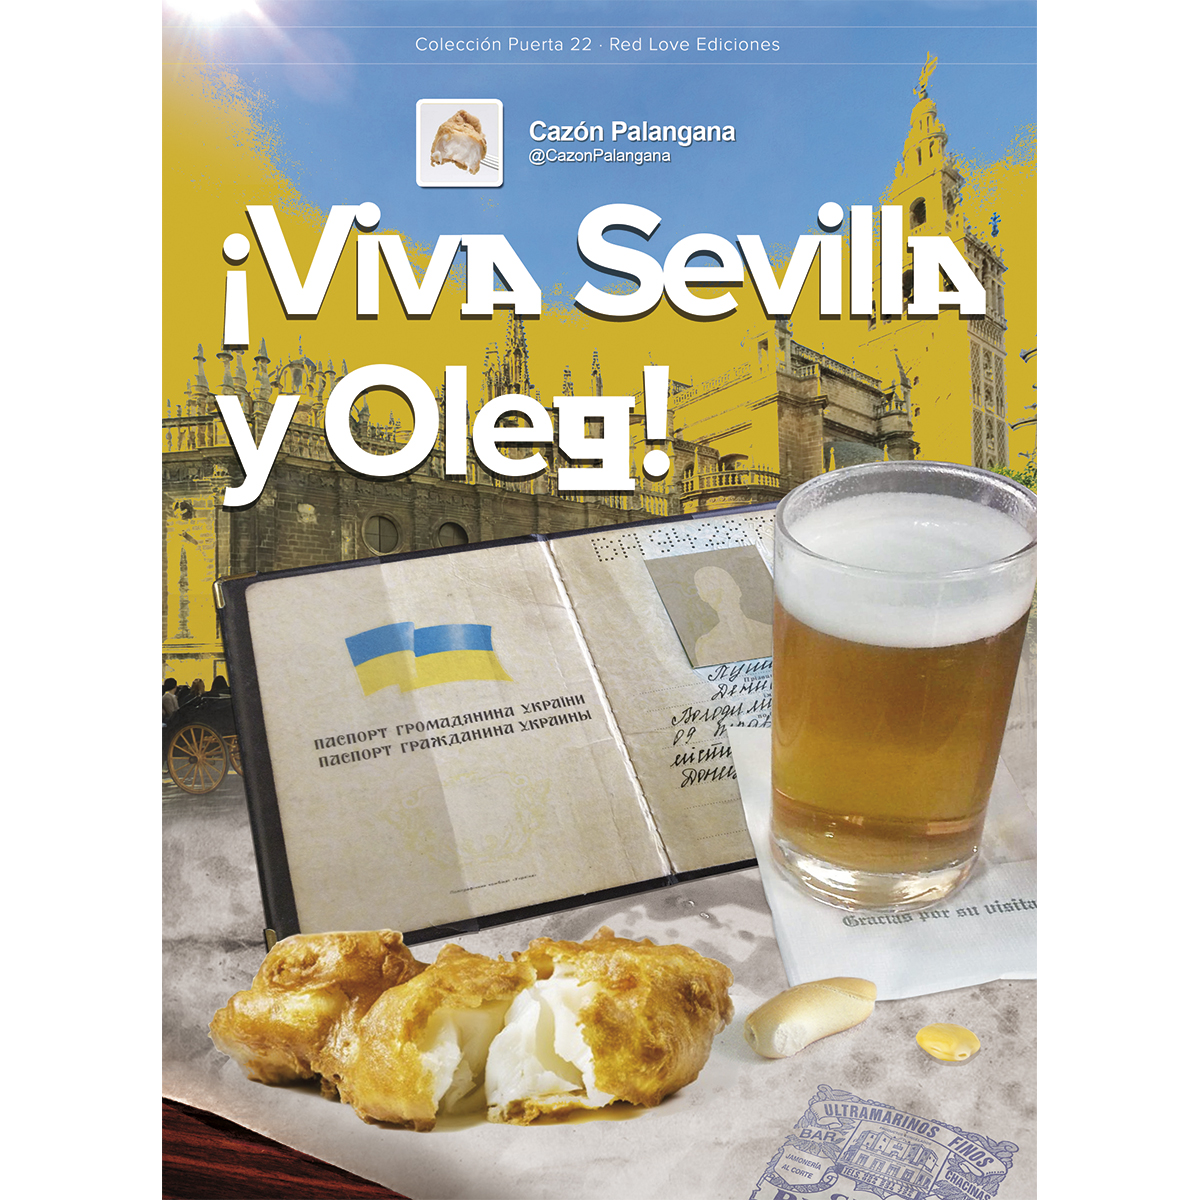 VIVA-SEVILLA-Y-OLEG